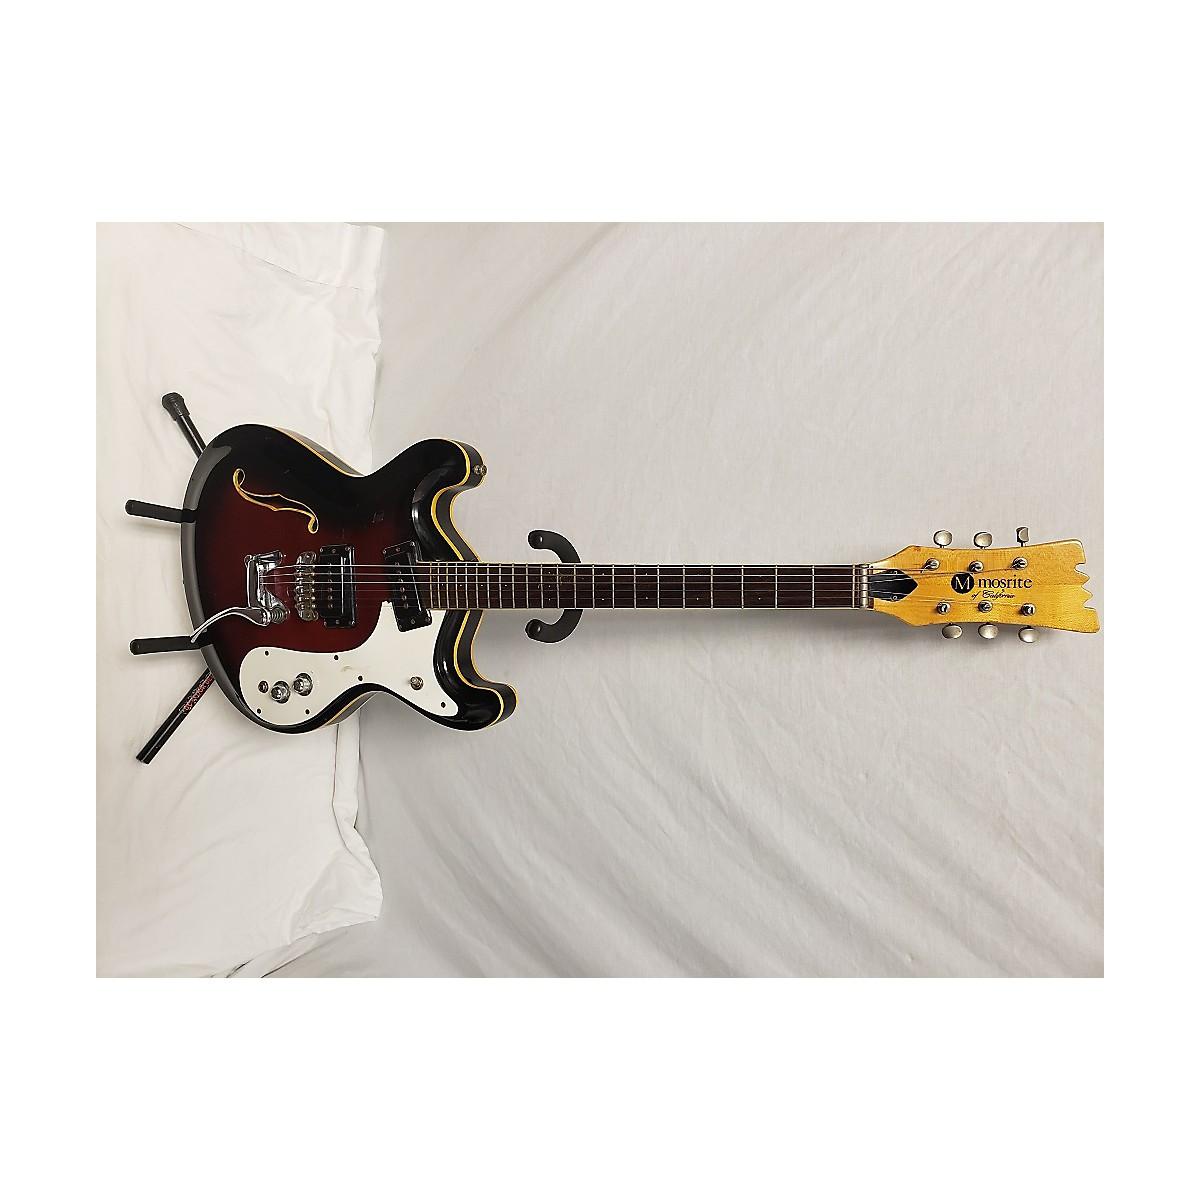 Mosrite 1960s COMBO Hollow Body Electric Guitar